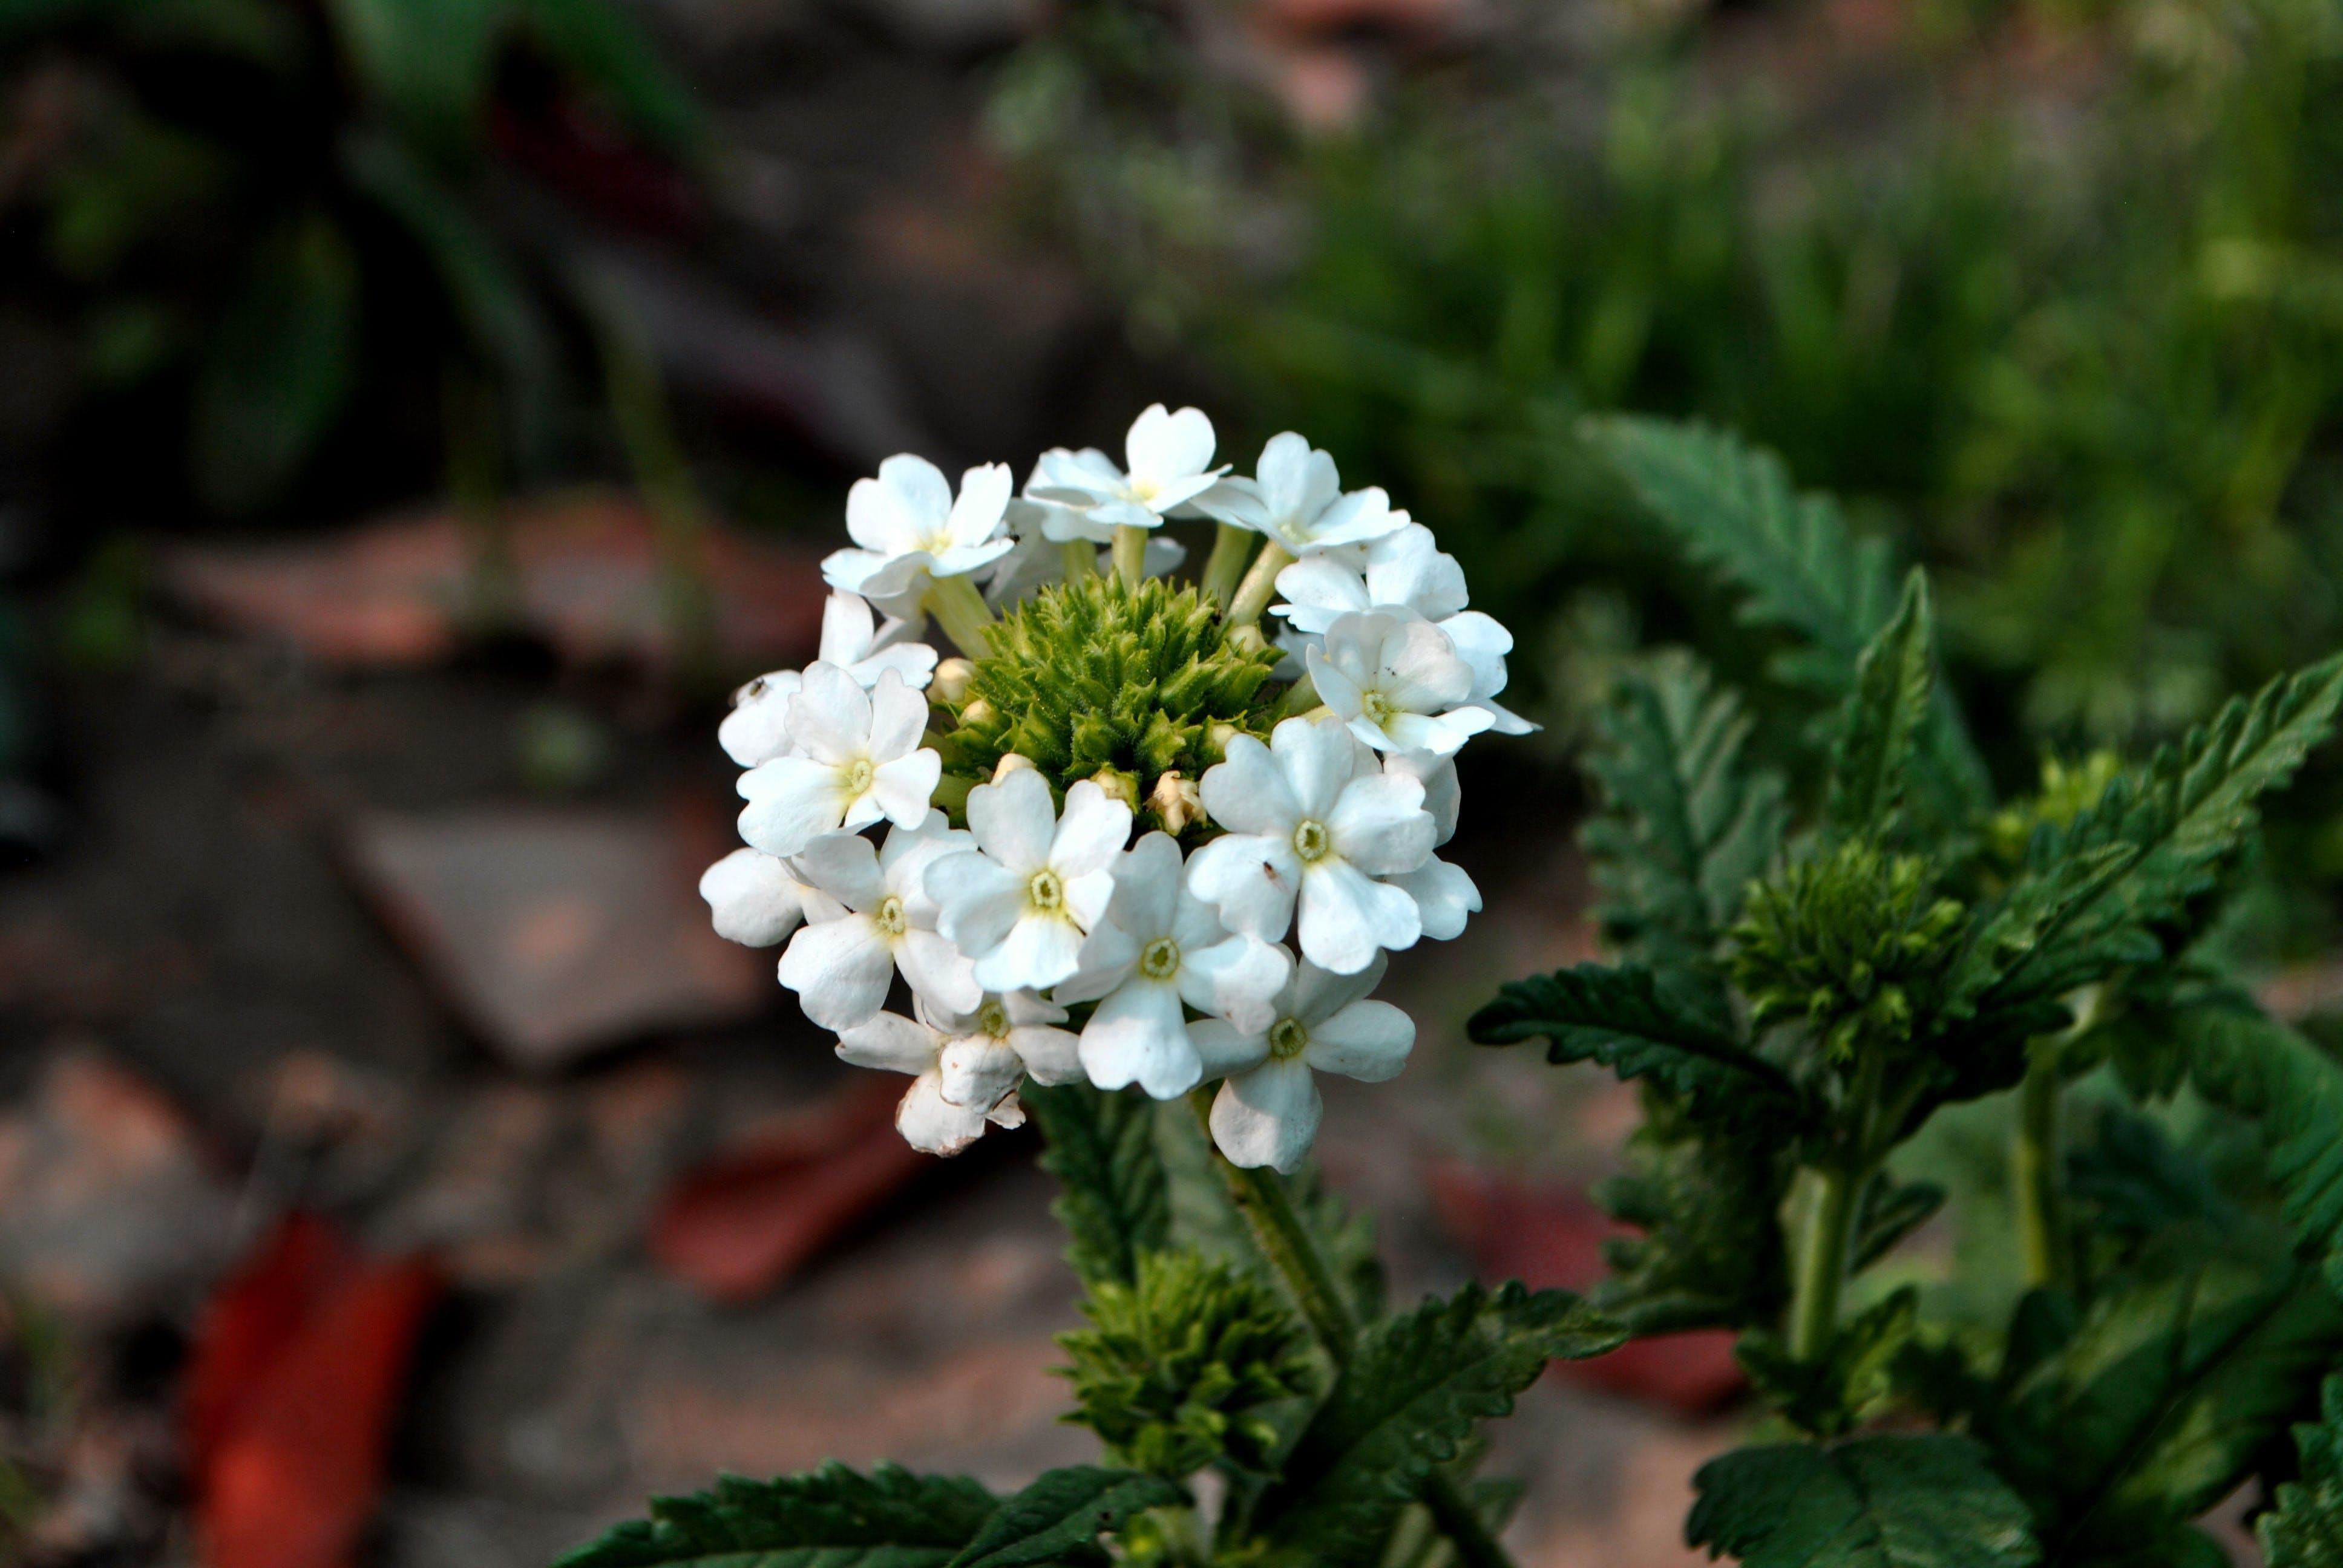 Free stock photo of flowers, white flower